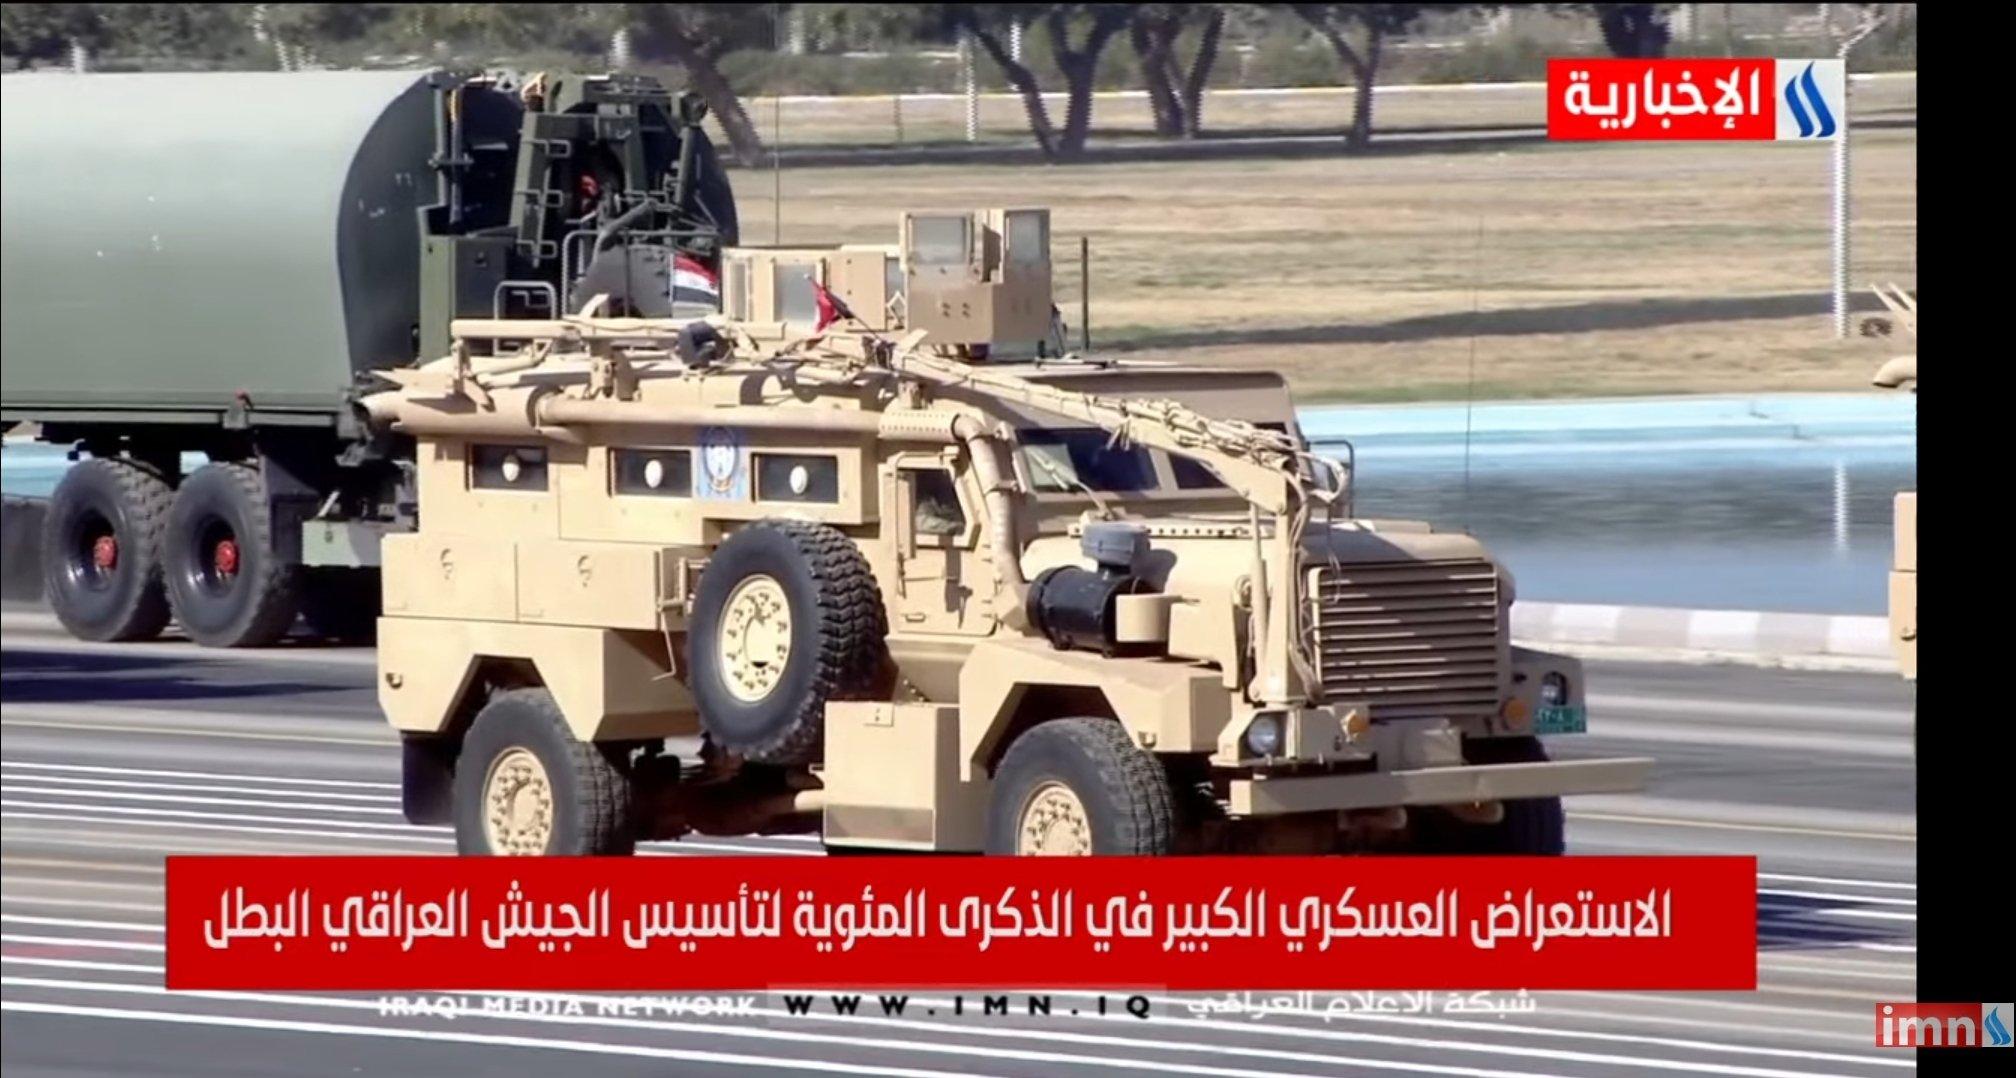 Armée Irakienne / Iraqi Armed Forces - Page 38 ErHyFDyXMAAZgPz?format=jpg&name=large